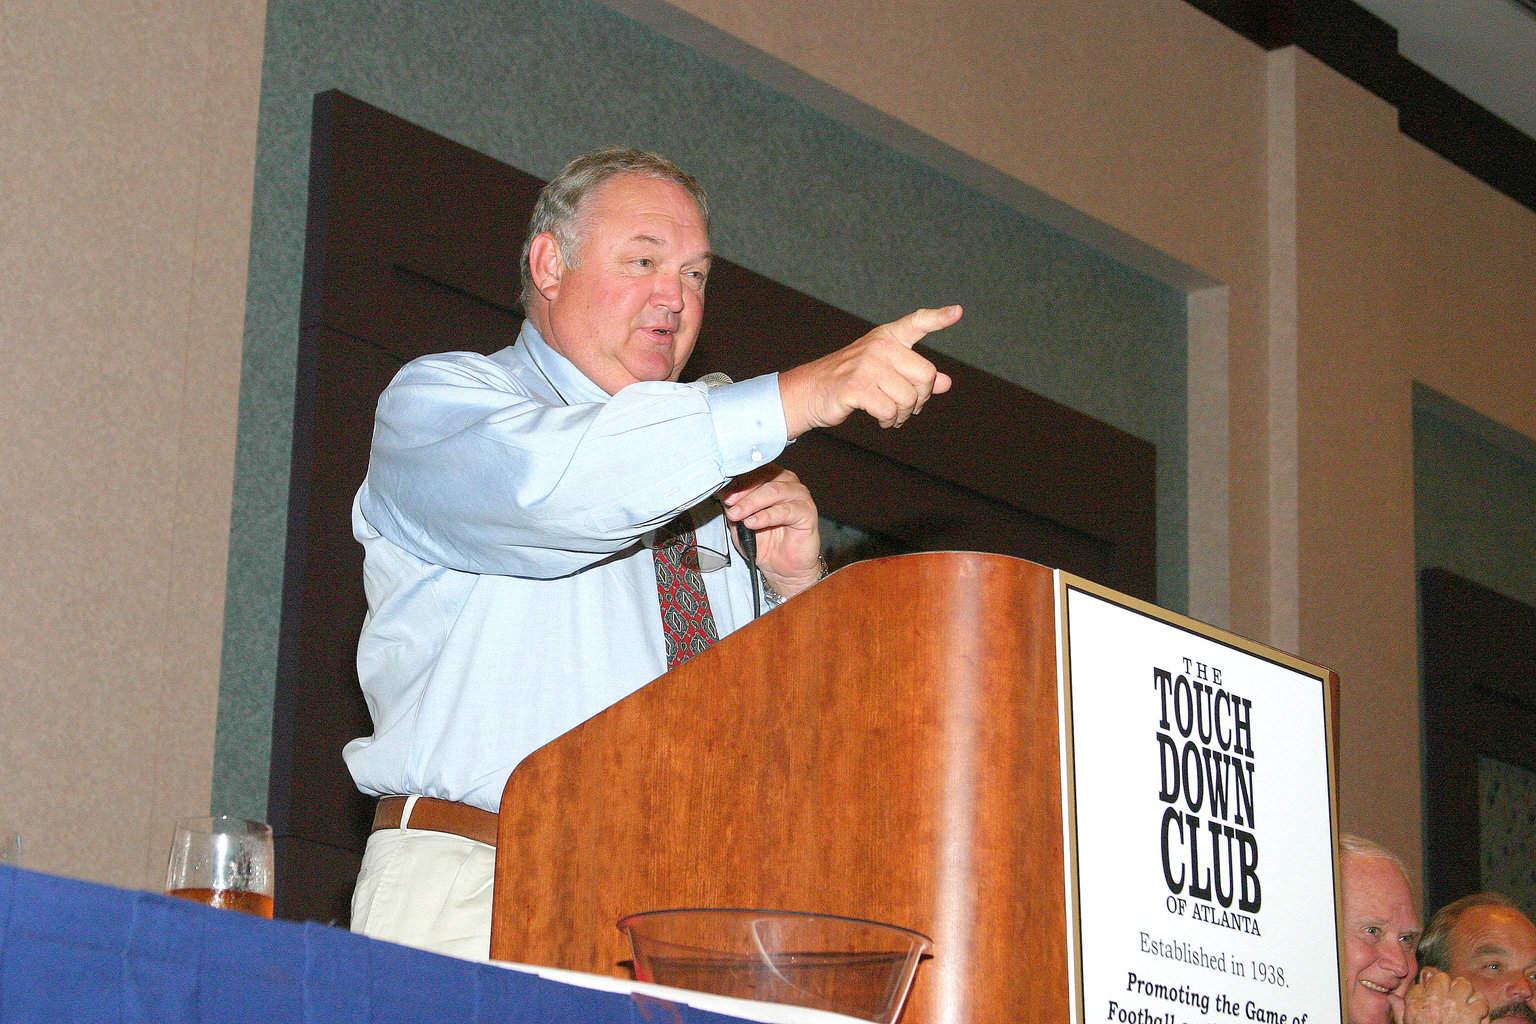 9-20-04 TCA Member & former UGA letterman Curtis McGill